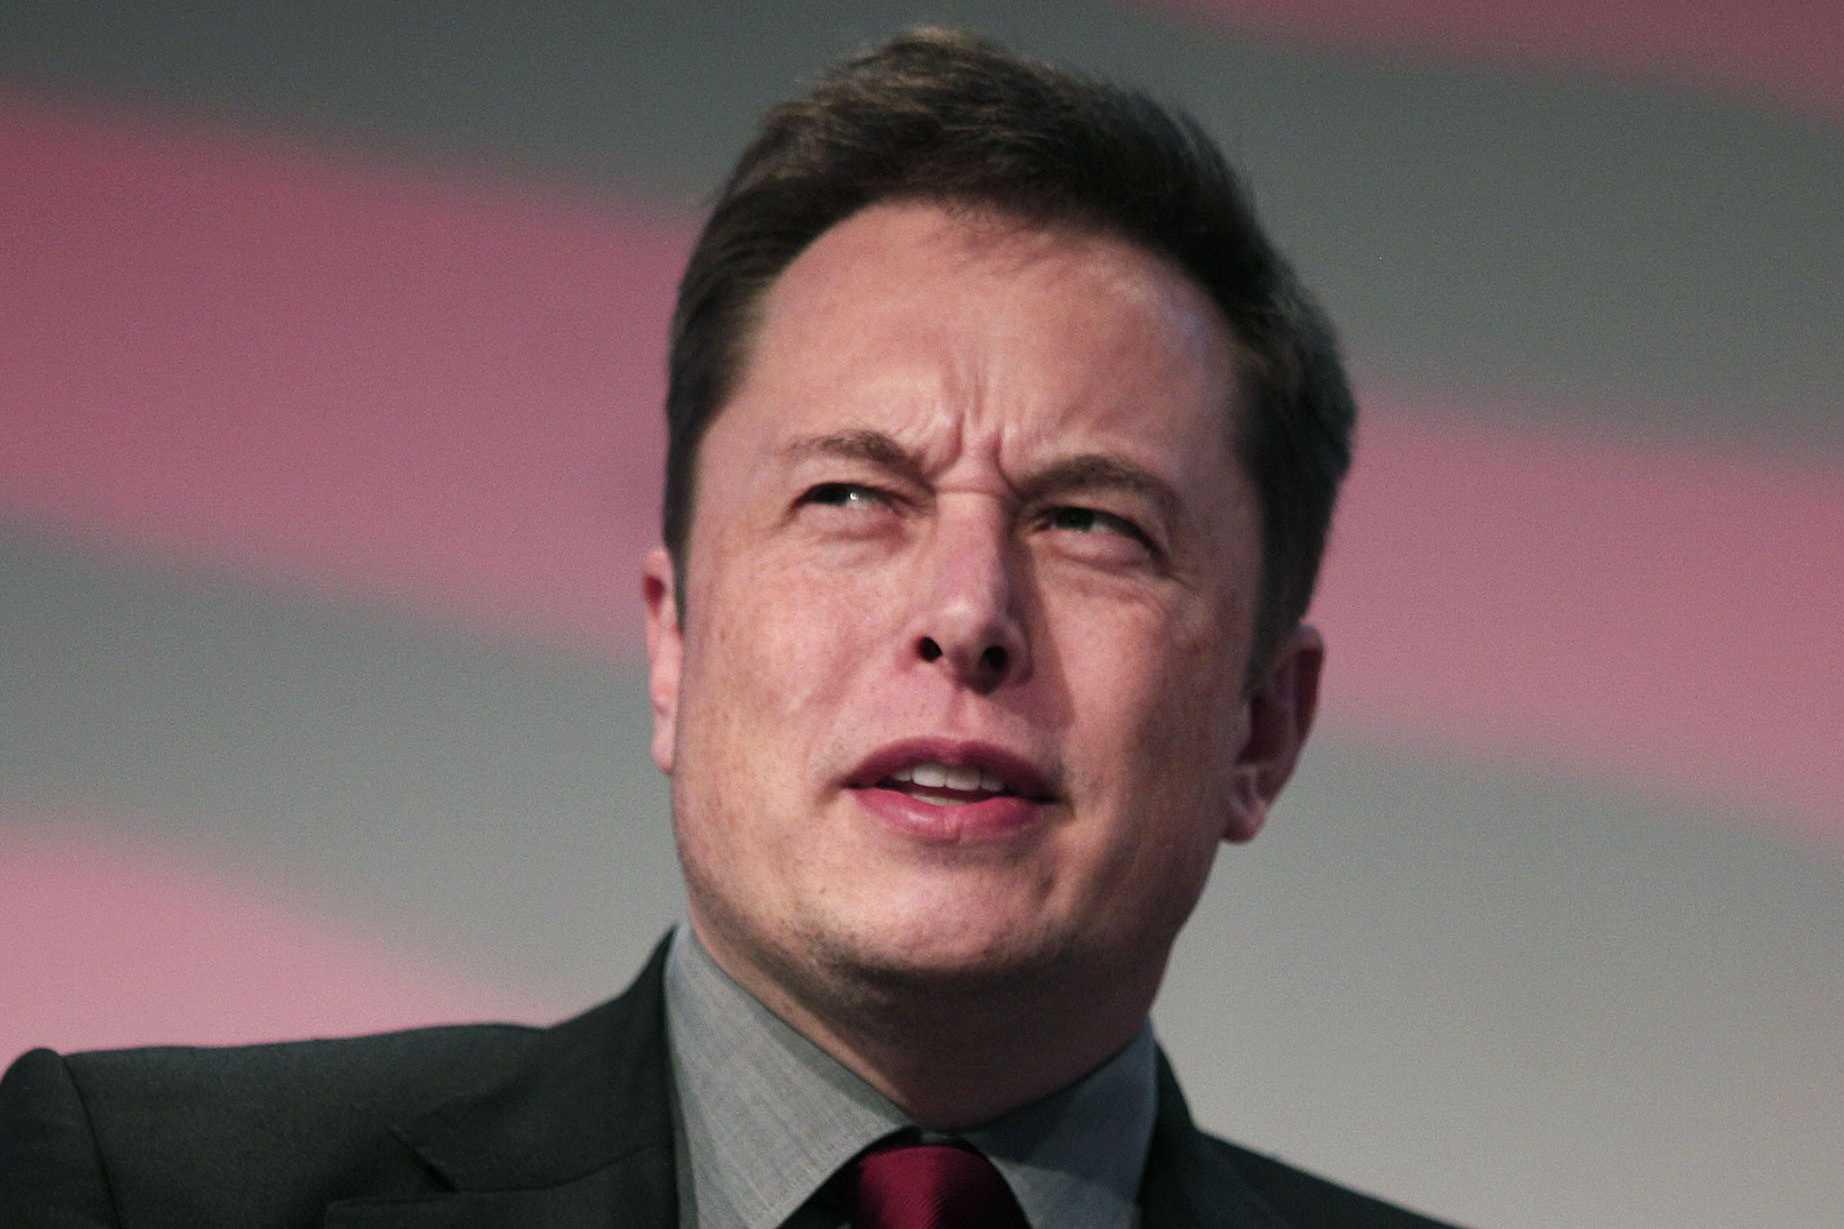 Elon Musk Flying Cars Boring Tunnels Future Underground - 3732669